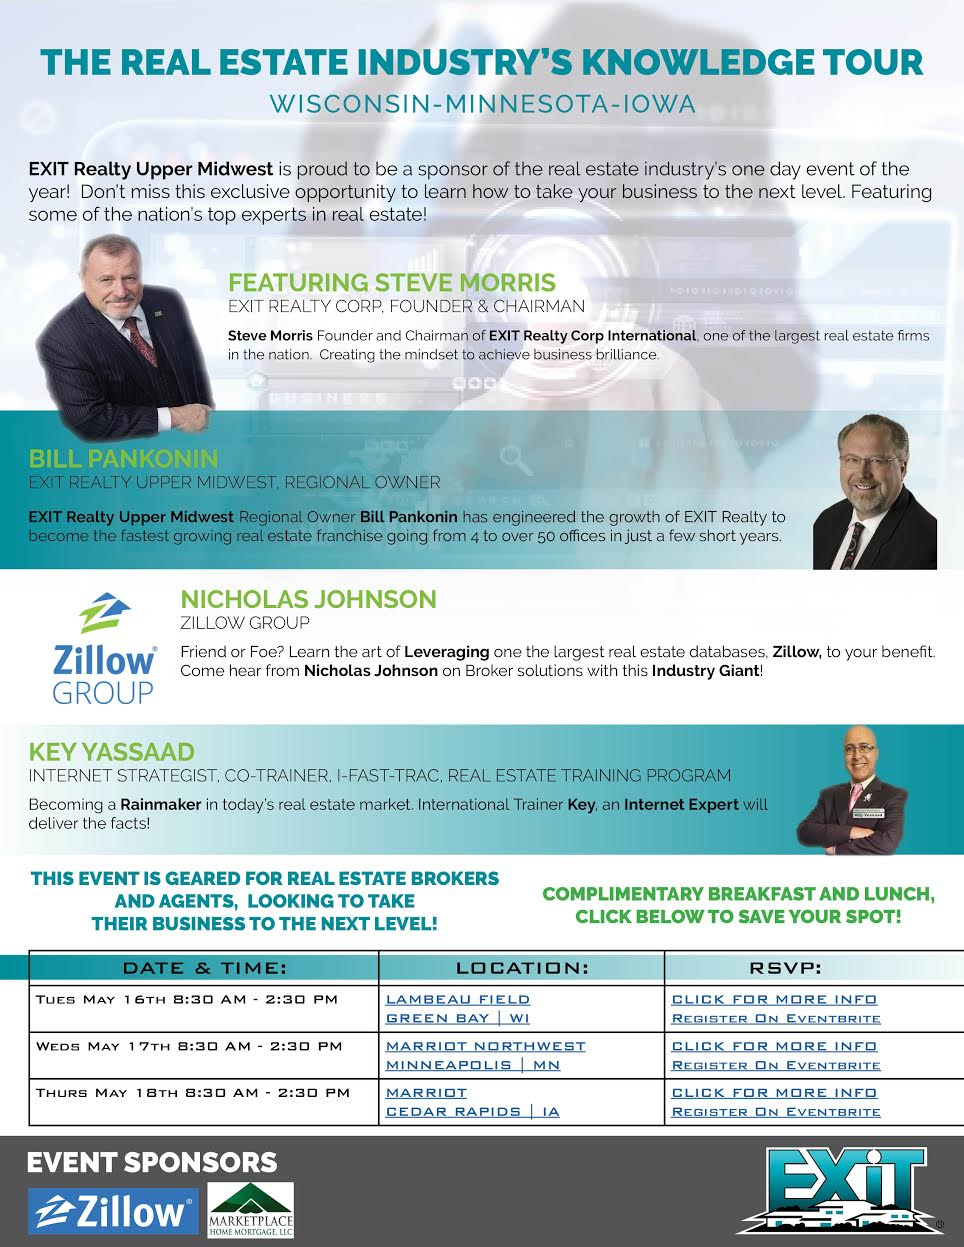 EXIT Real Estate Knowledge Tour